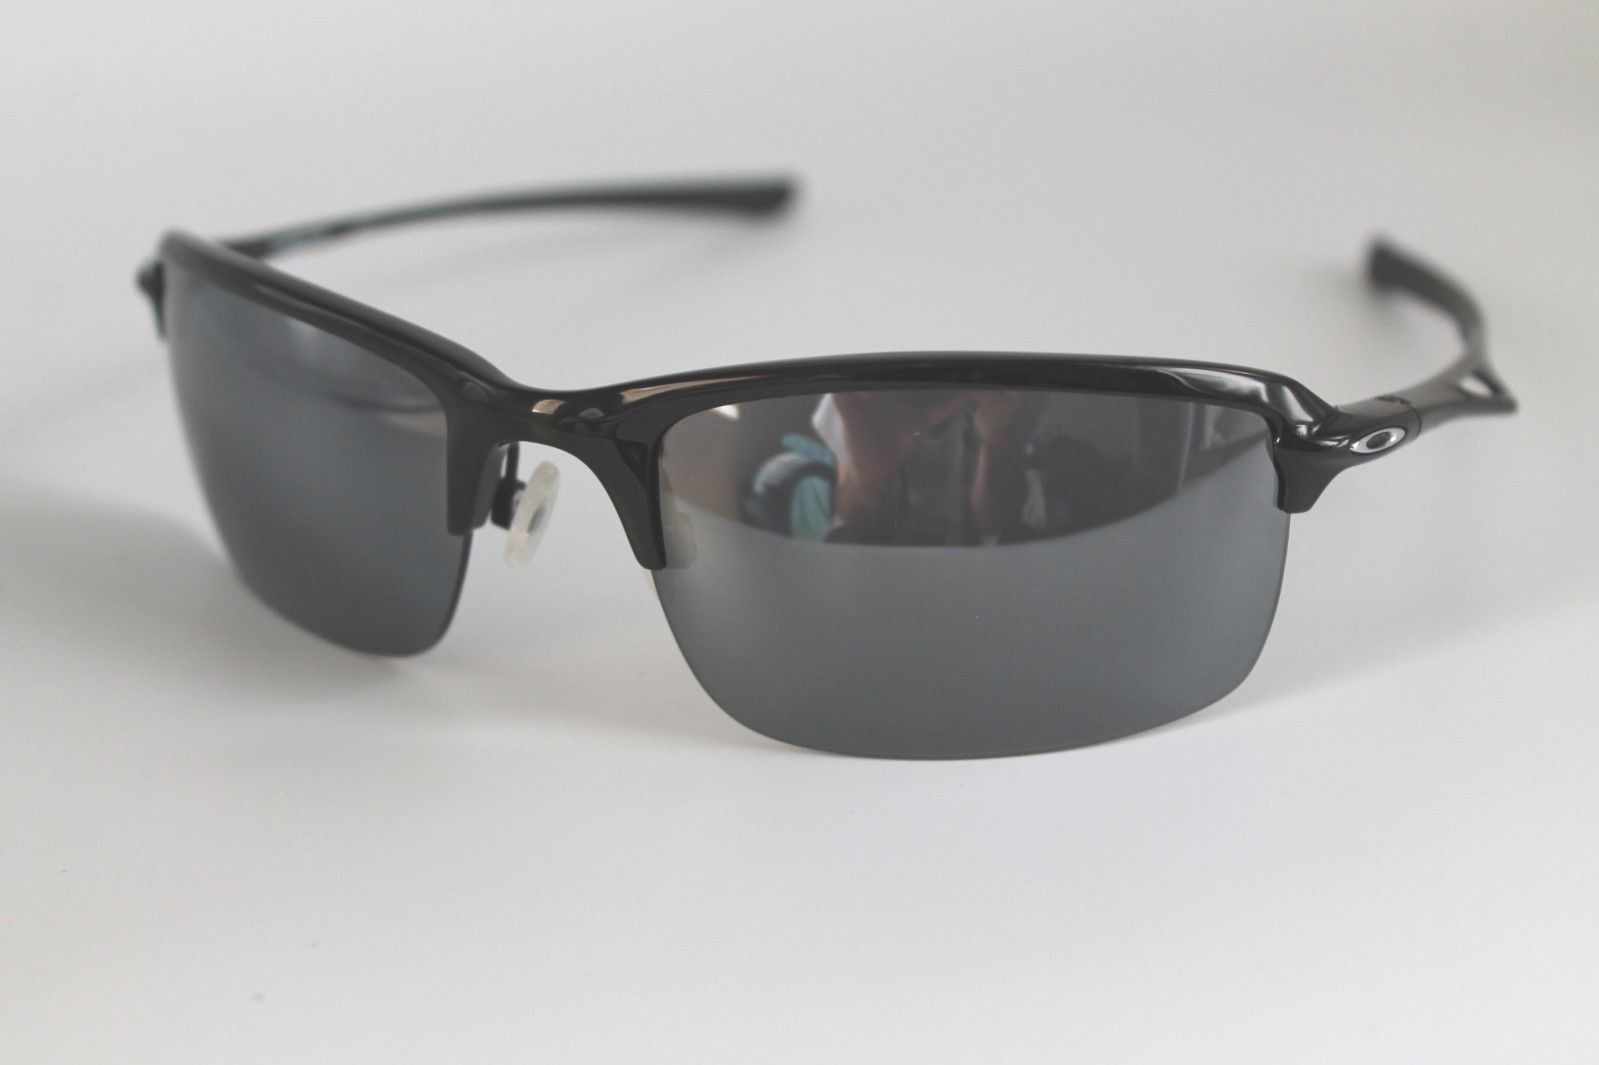 4ab9ed4d09 57. 57. Previous. Oakley Wiretap Sunglasses OO4071-01 Polished Black Frame  W  Black Iridium Lens